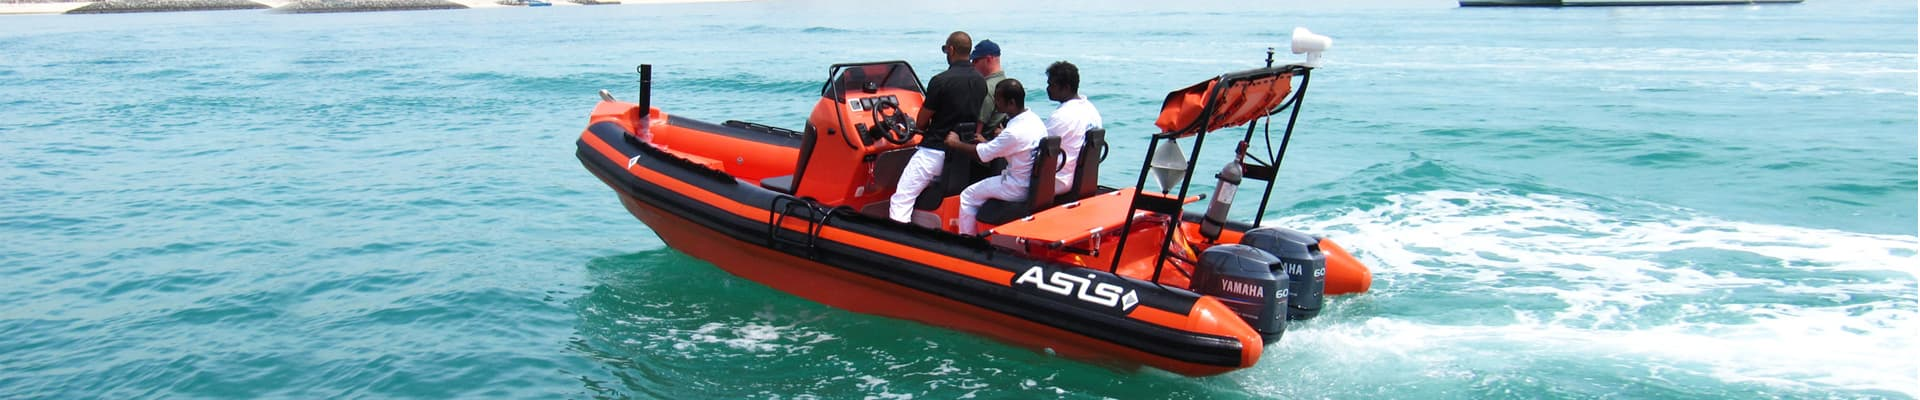 Solas-Rescue